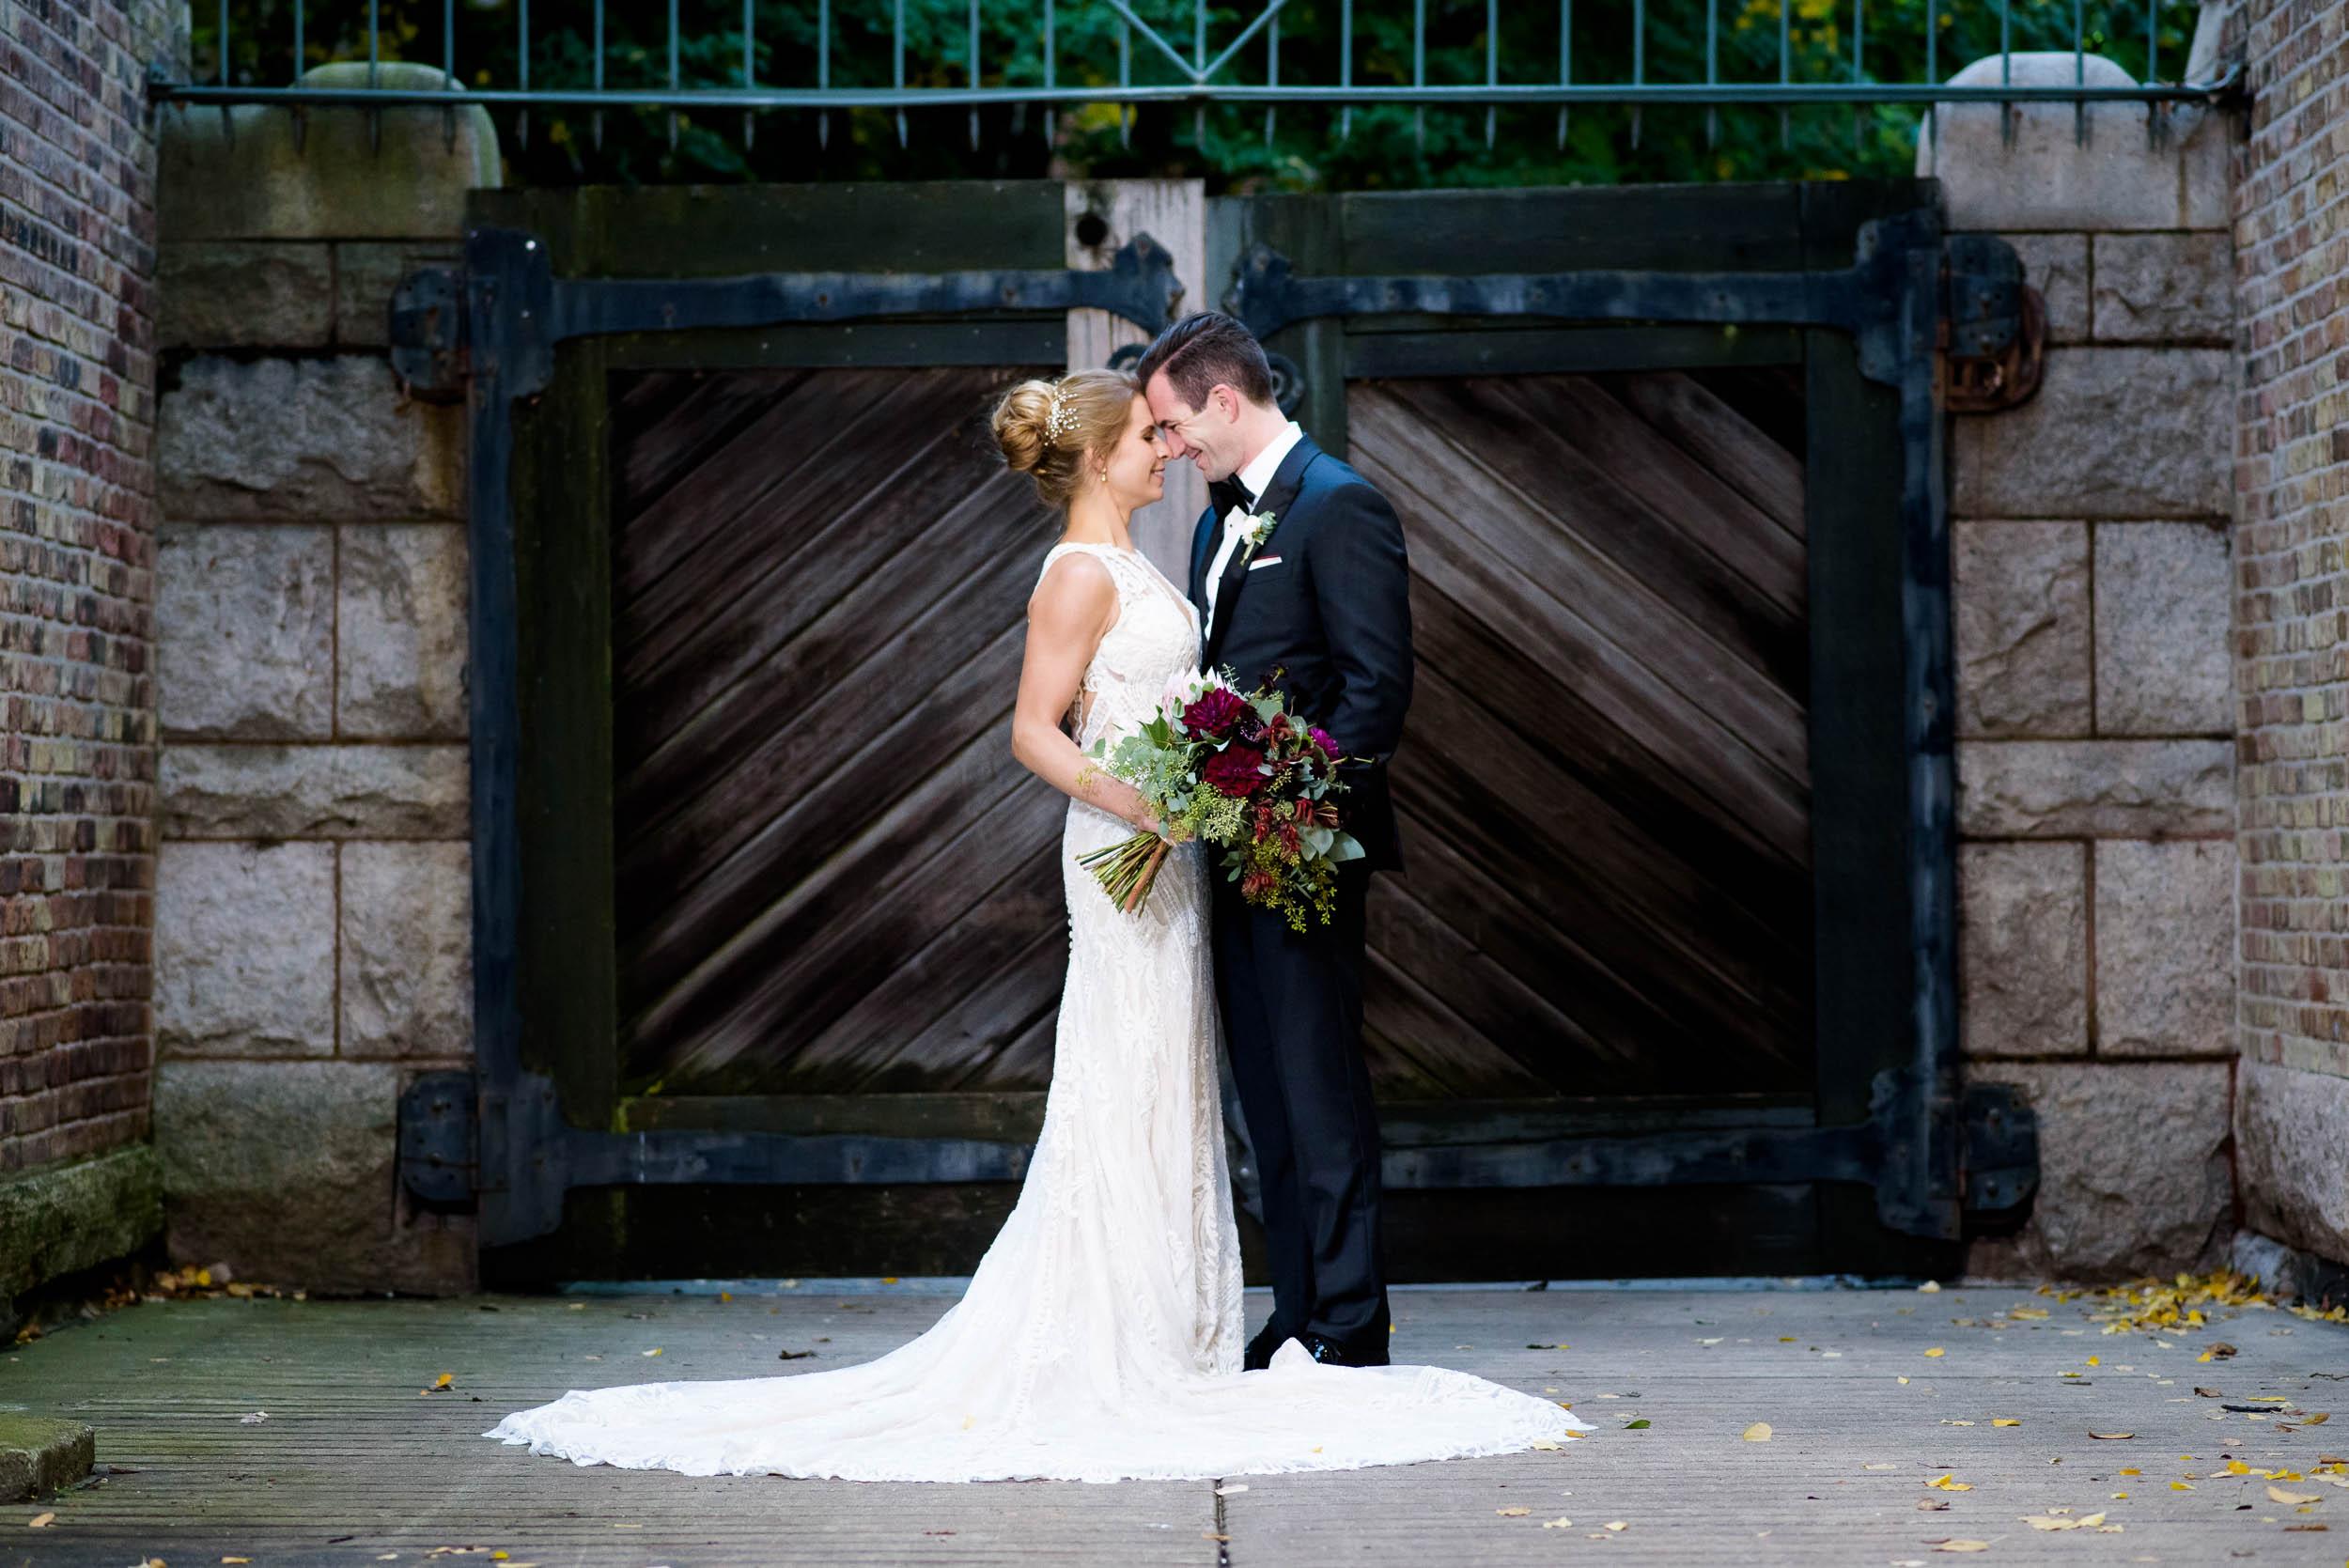 Wedding portrait during a Glessner House Chicago wedding.